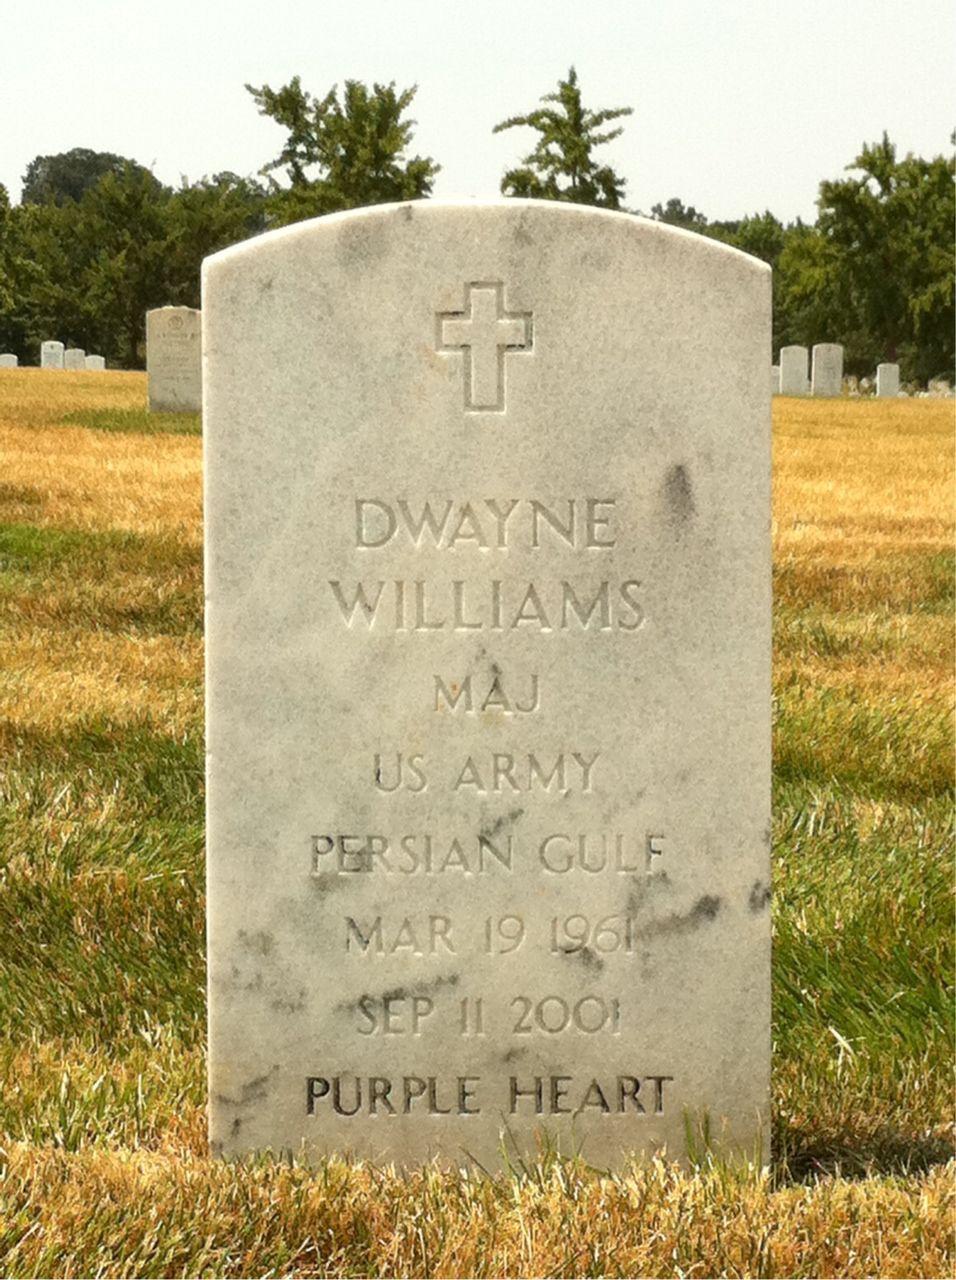 Dwayne Williams Headstone 090921.Jpeg